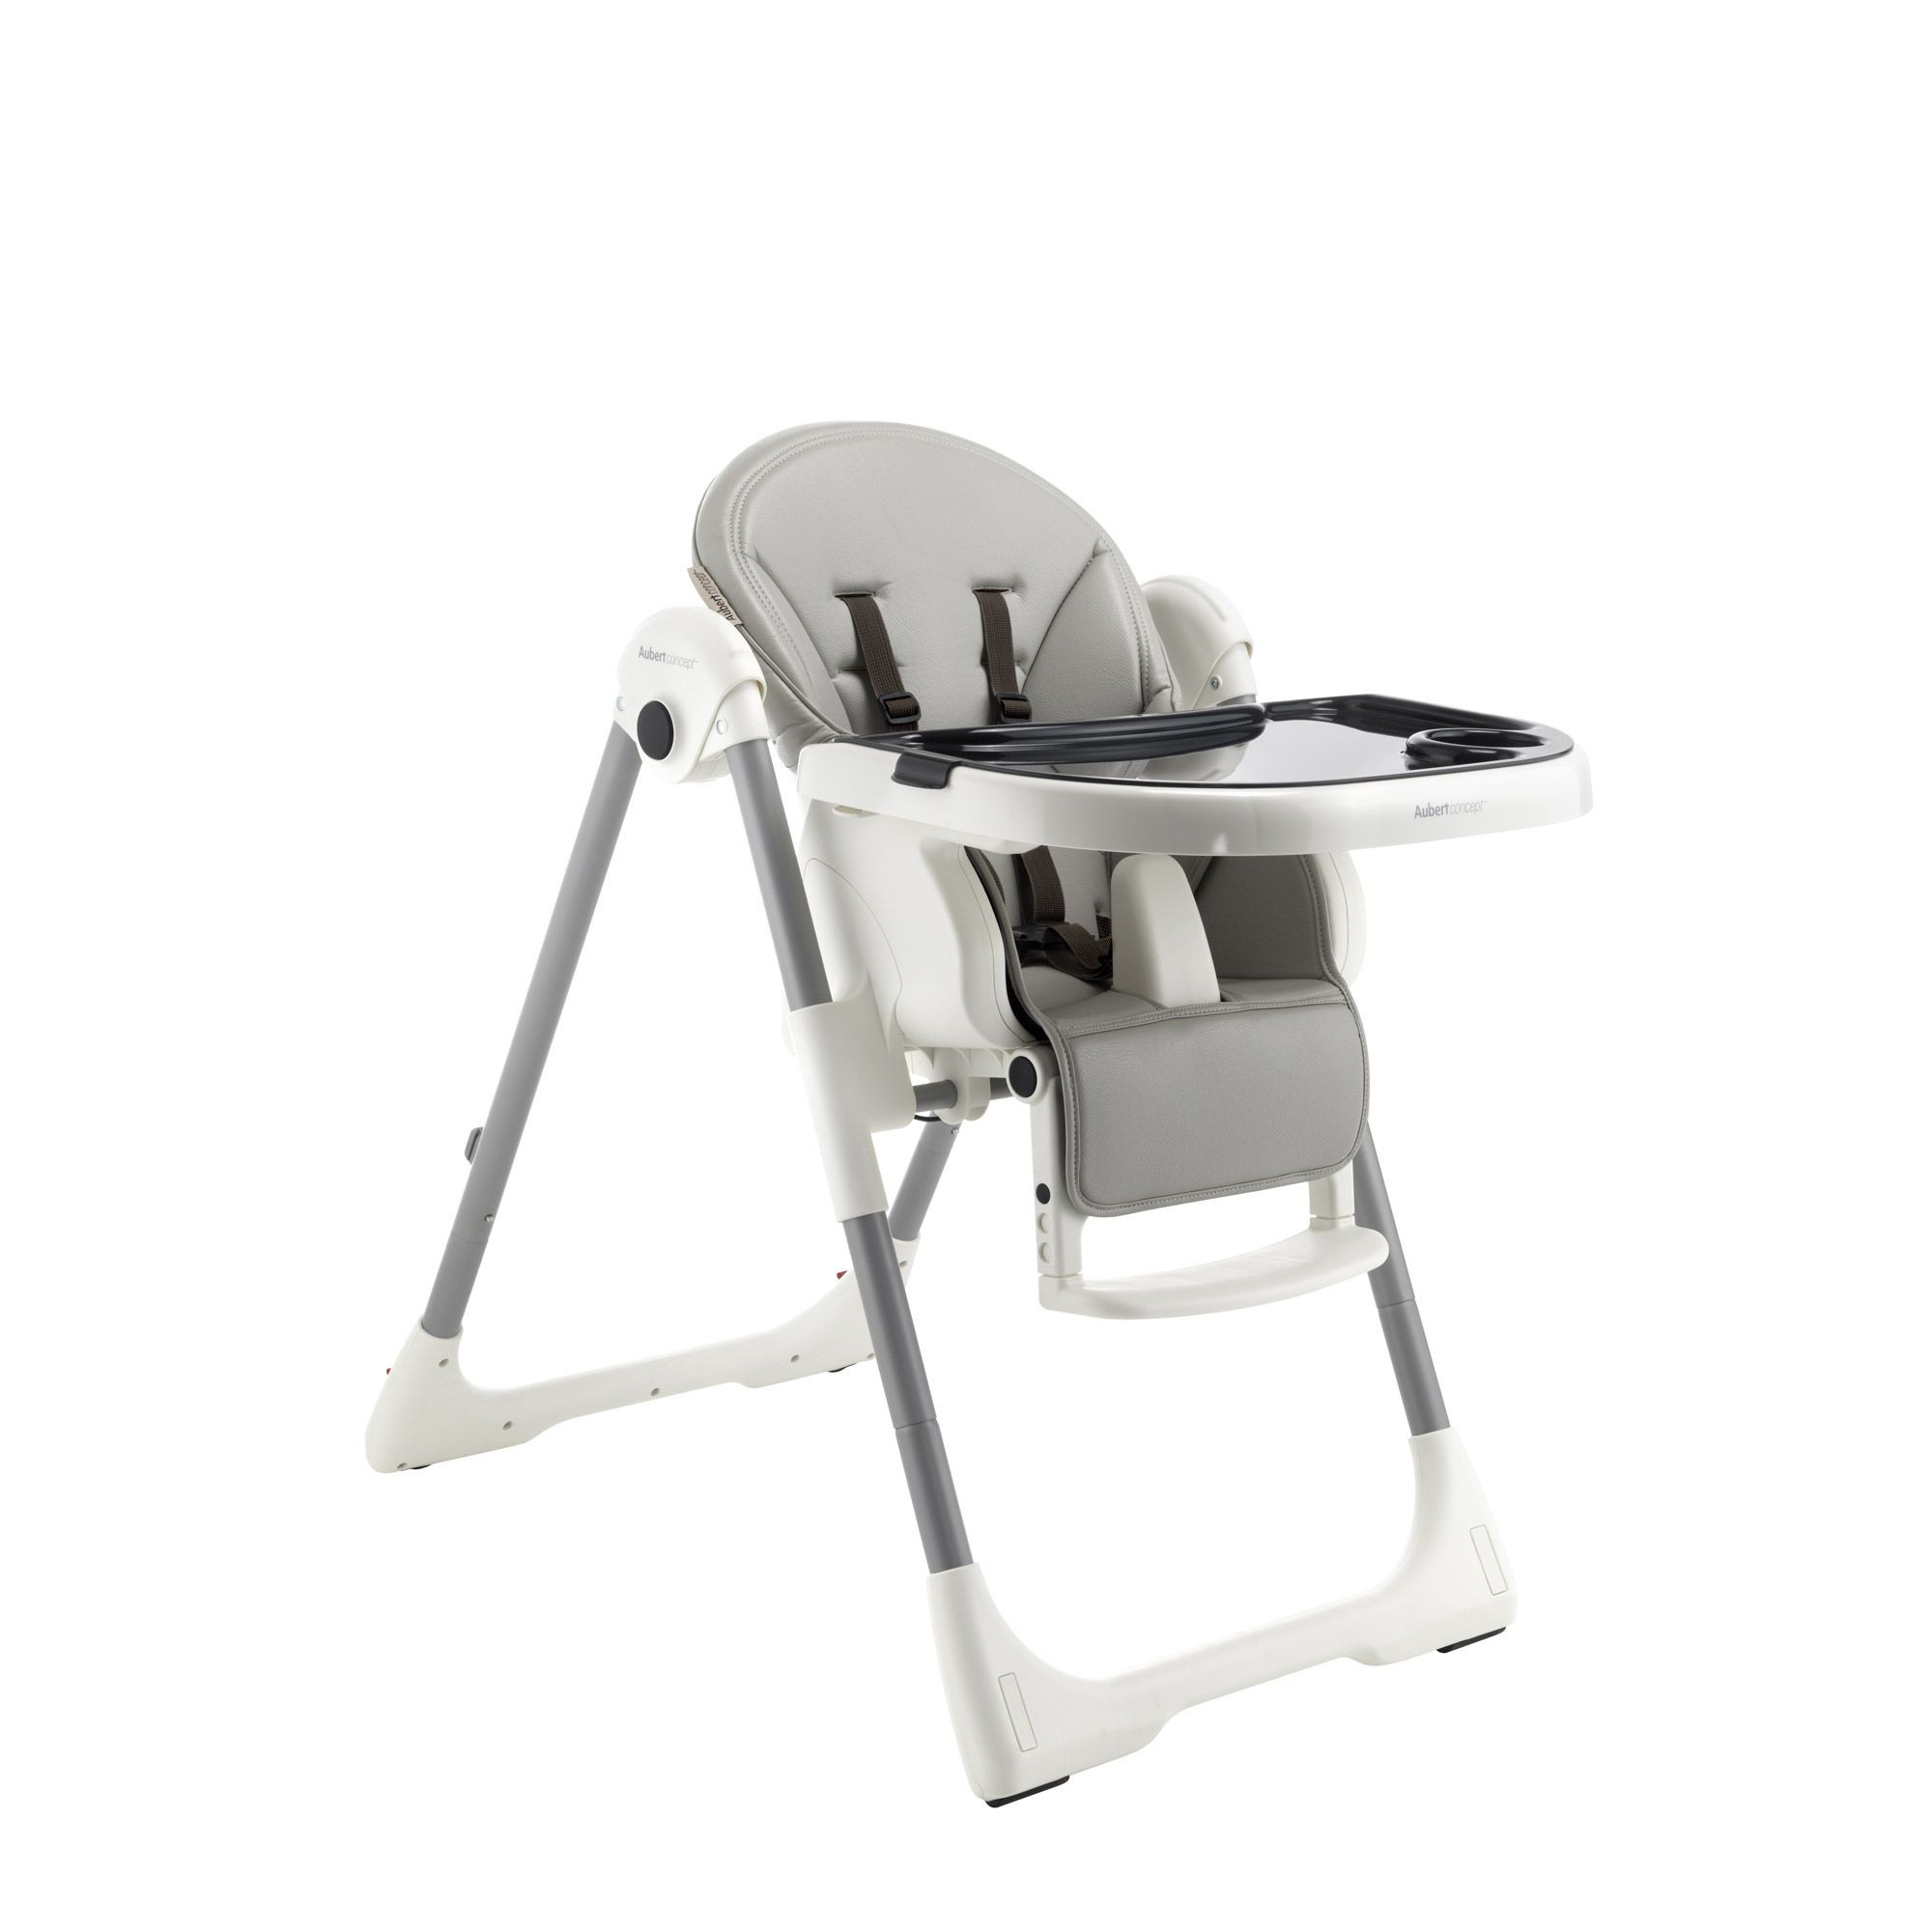 chaise haute design aubert concept avis. Black Bedroom Furniture Sets. Home Design Ideas